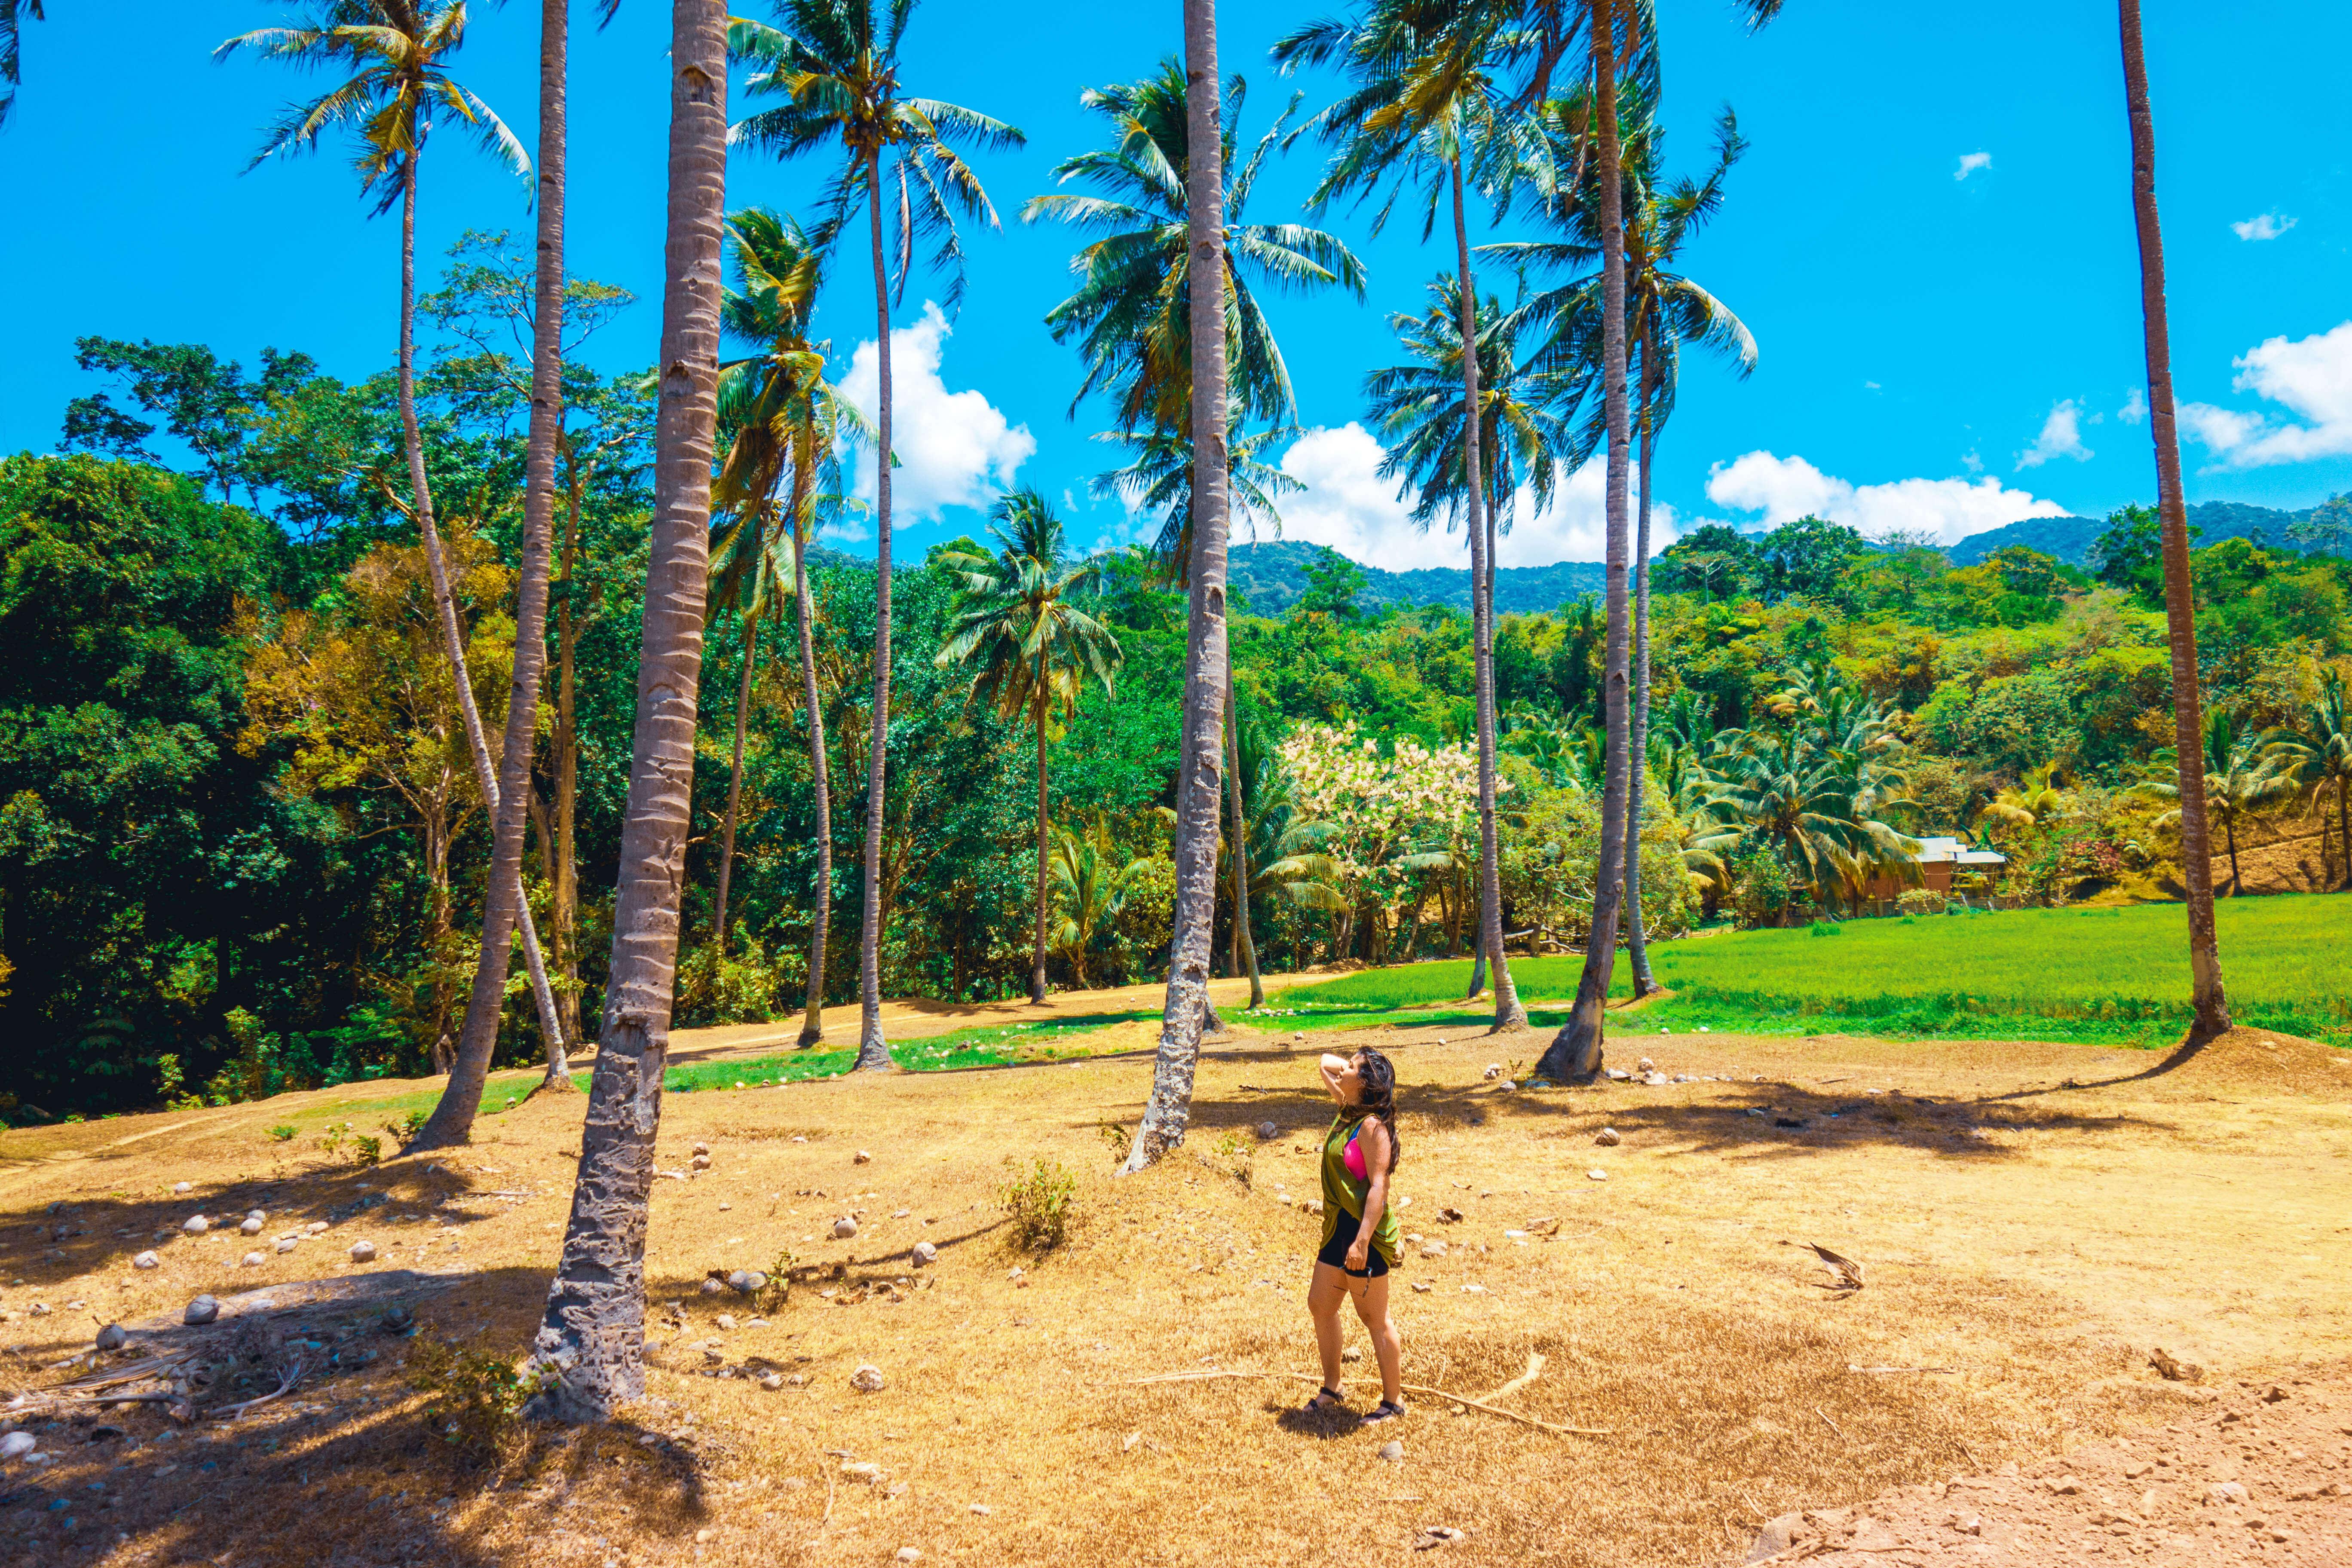 Views towards Bulalacao Fall